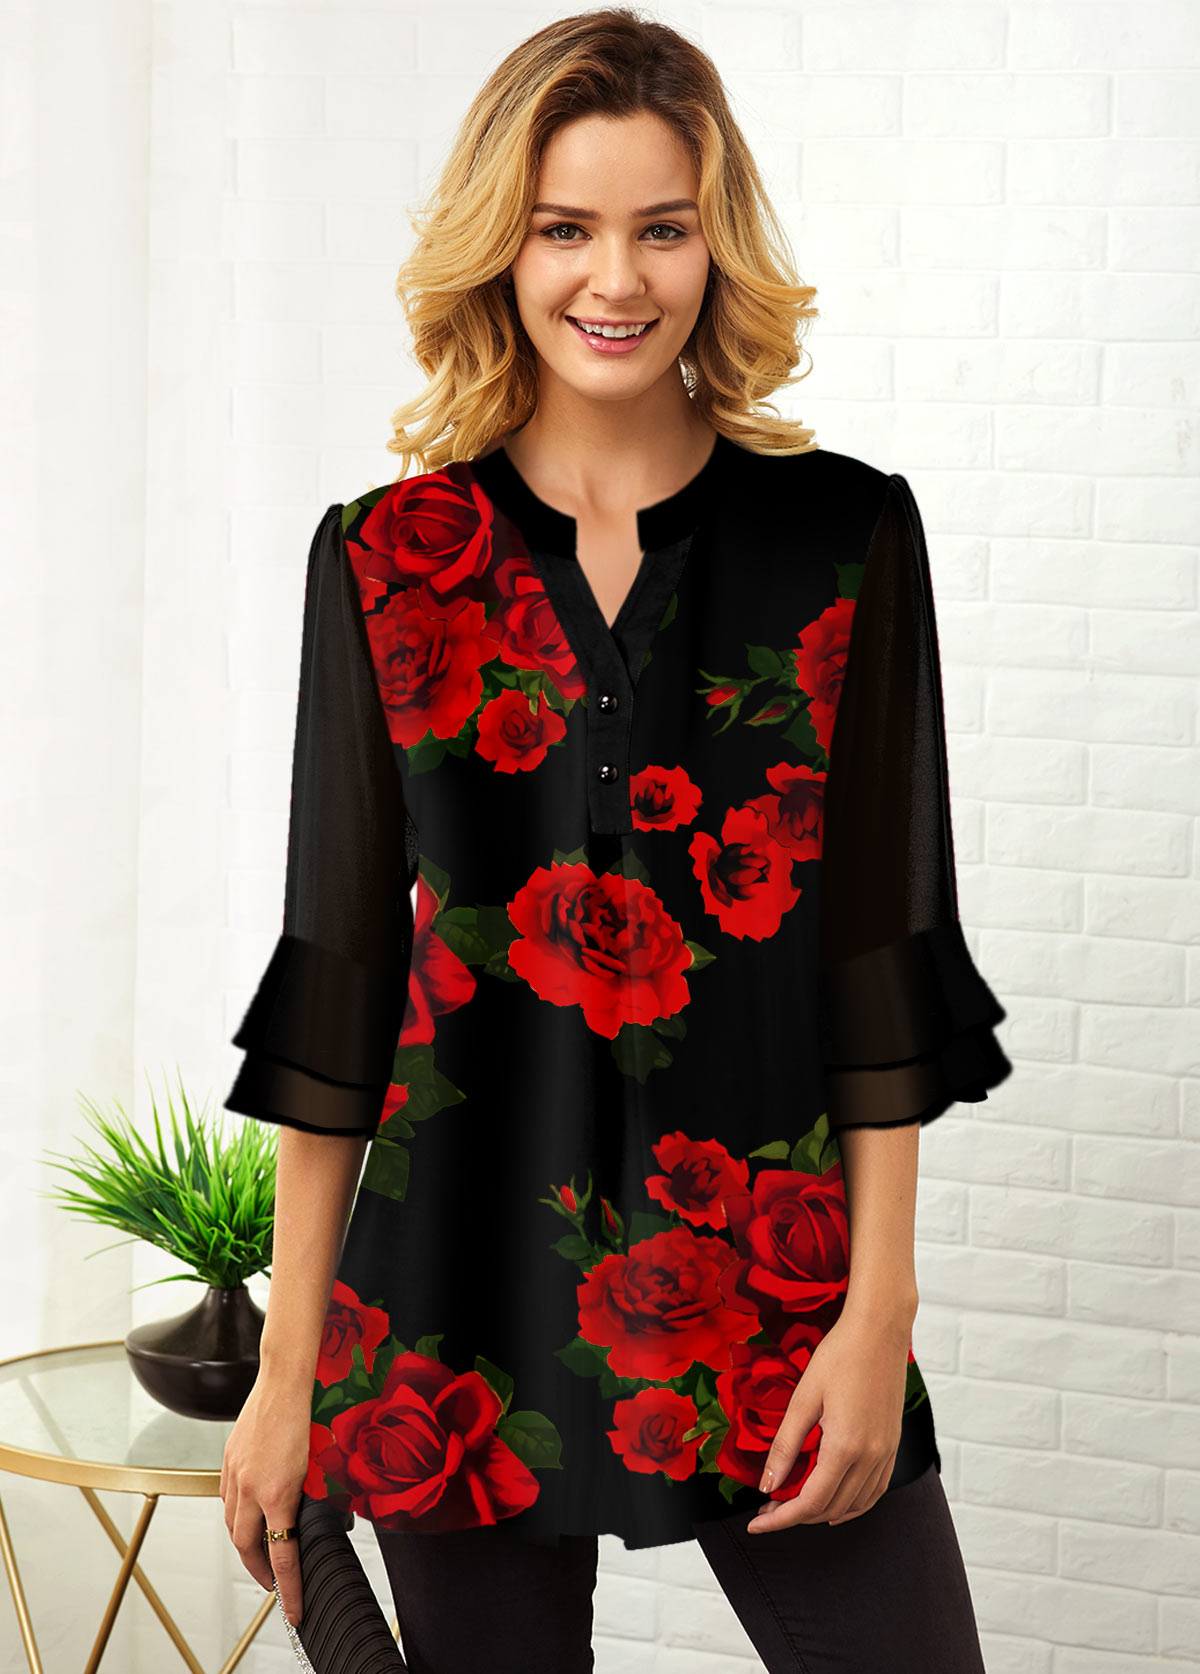 ROTITA Split Neck Floral Print Flare Cuff Blouse